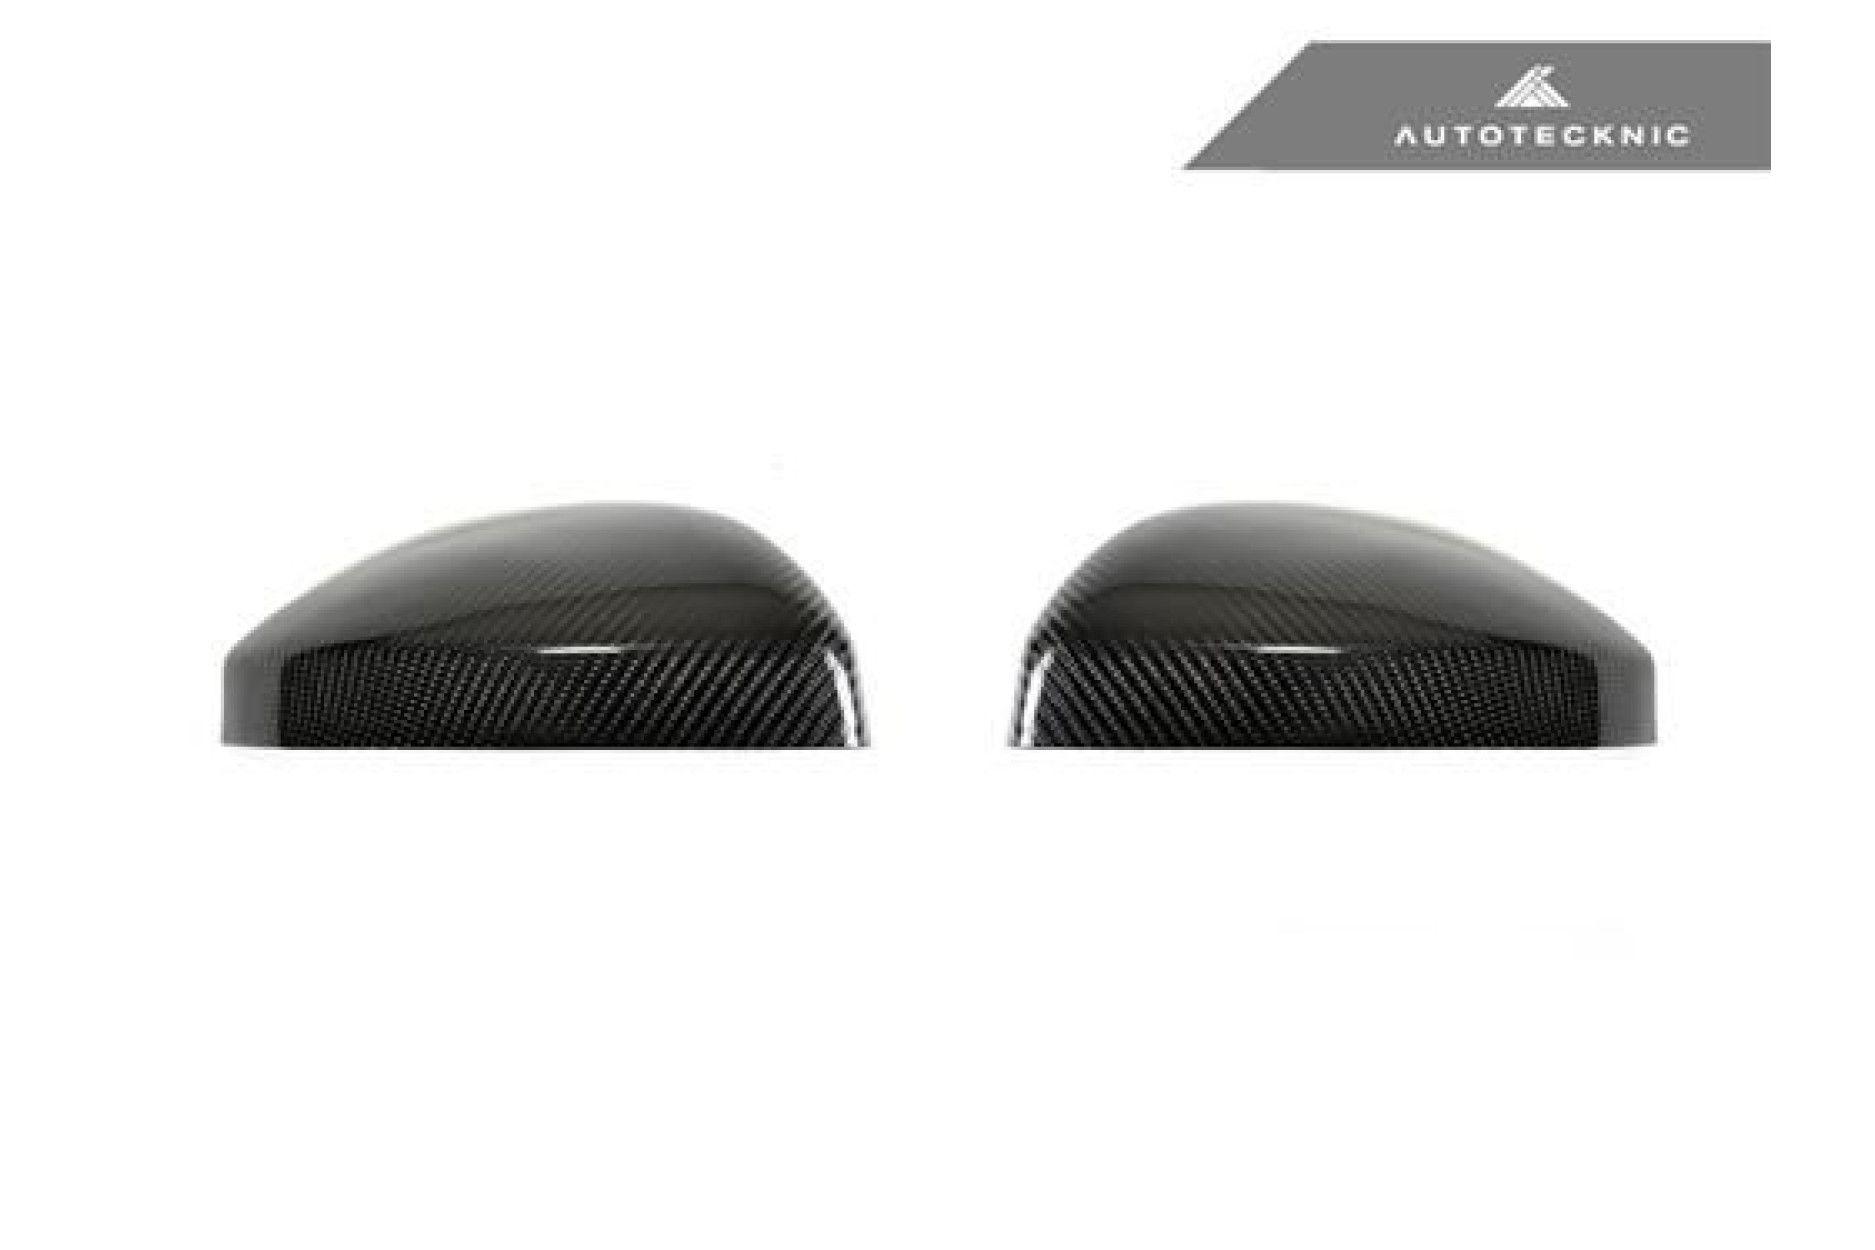 AutoTecknic Replacement Carbon Fiber Mirror Covers - Audi 8S MK3 TT/TTS 15-17 | 4S MK2 R8 16-18 without Side Assist